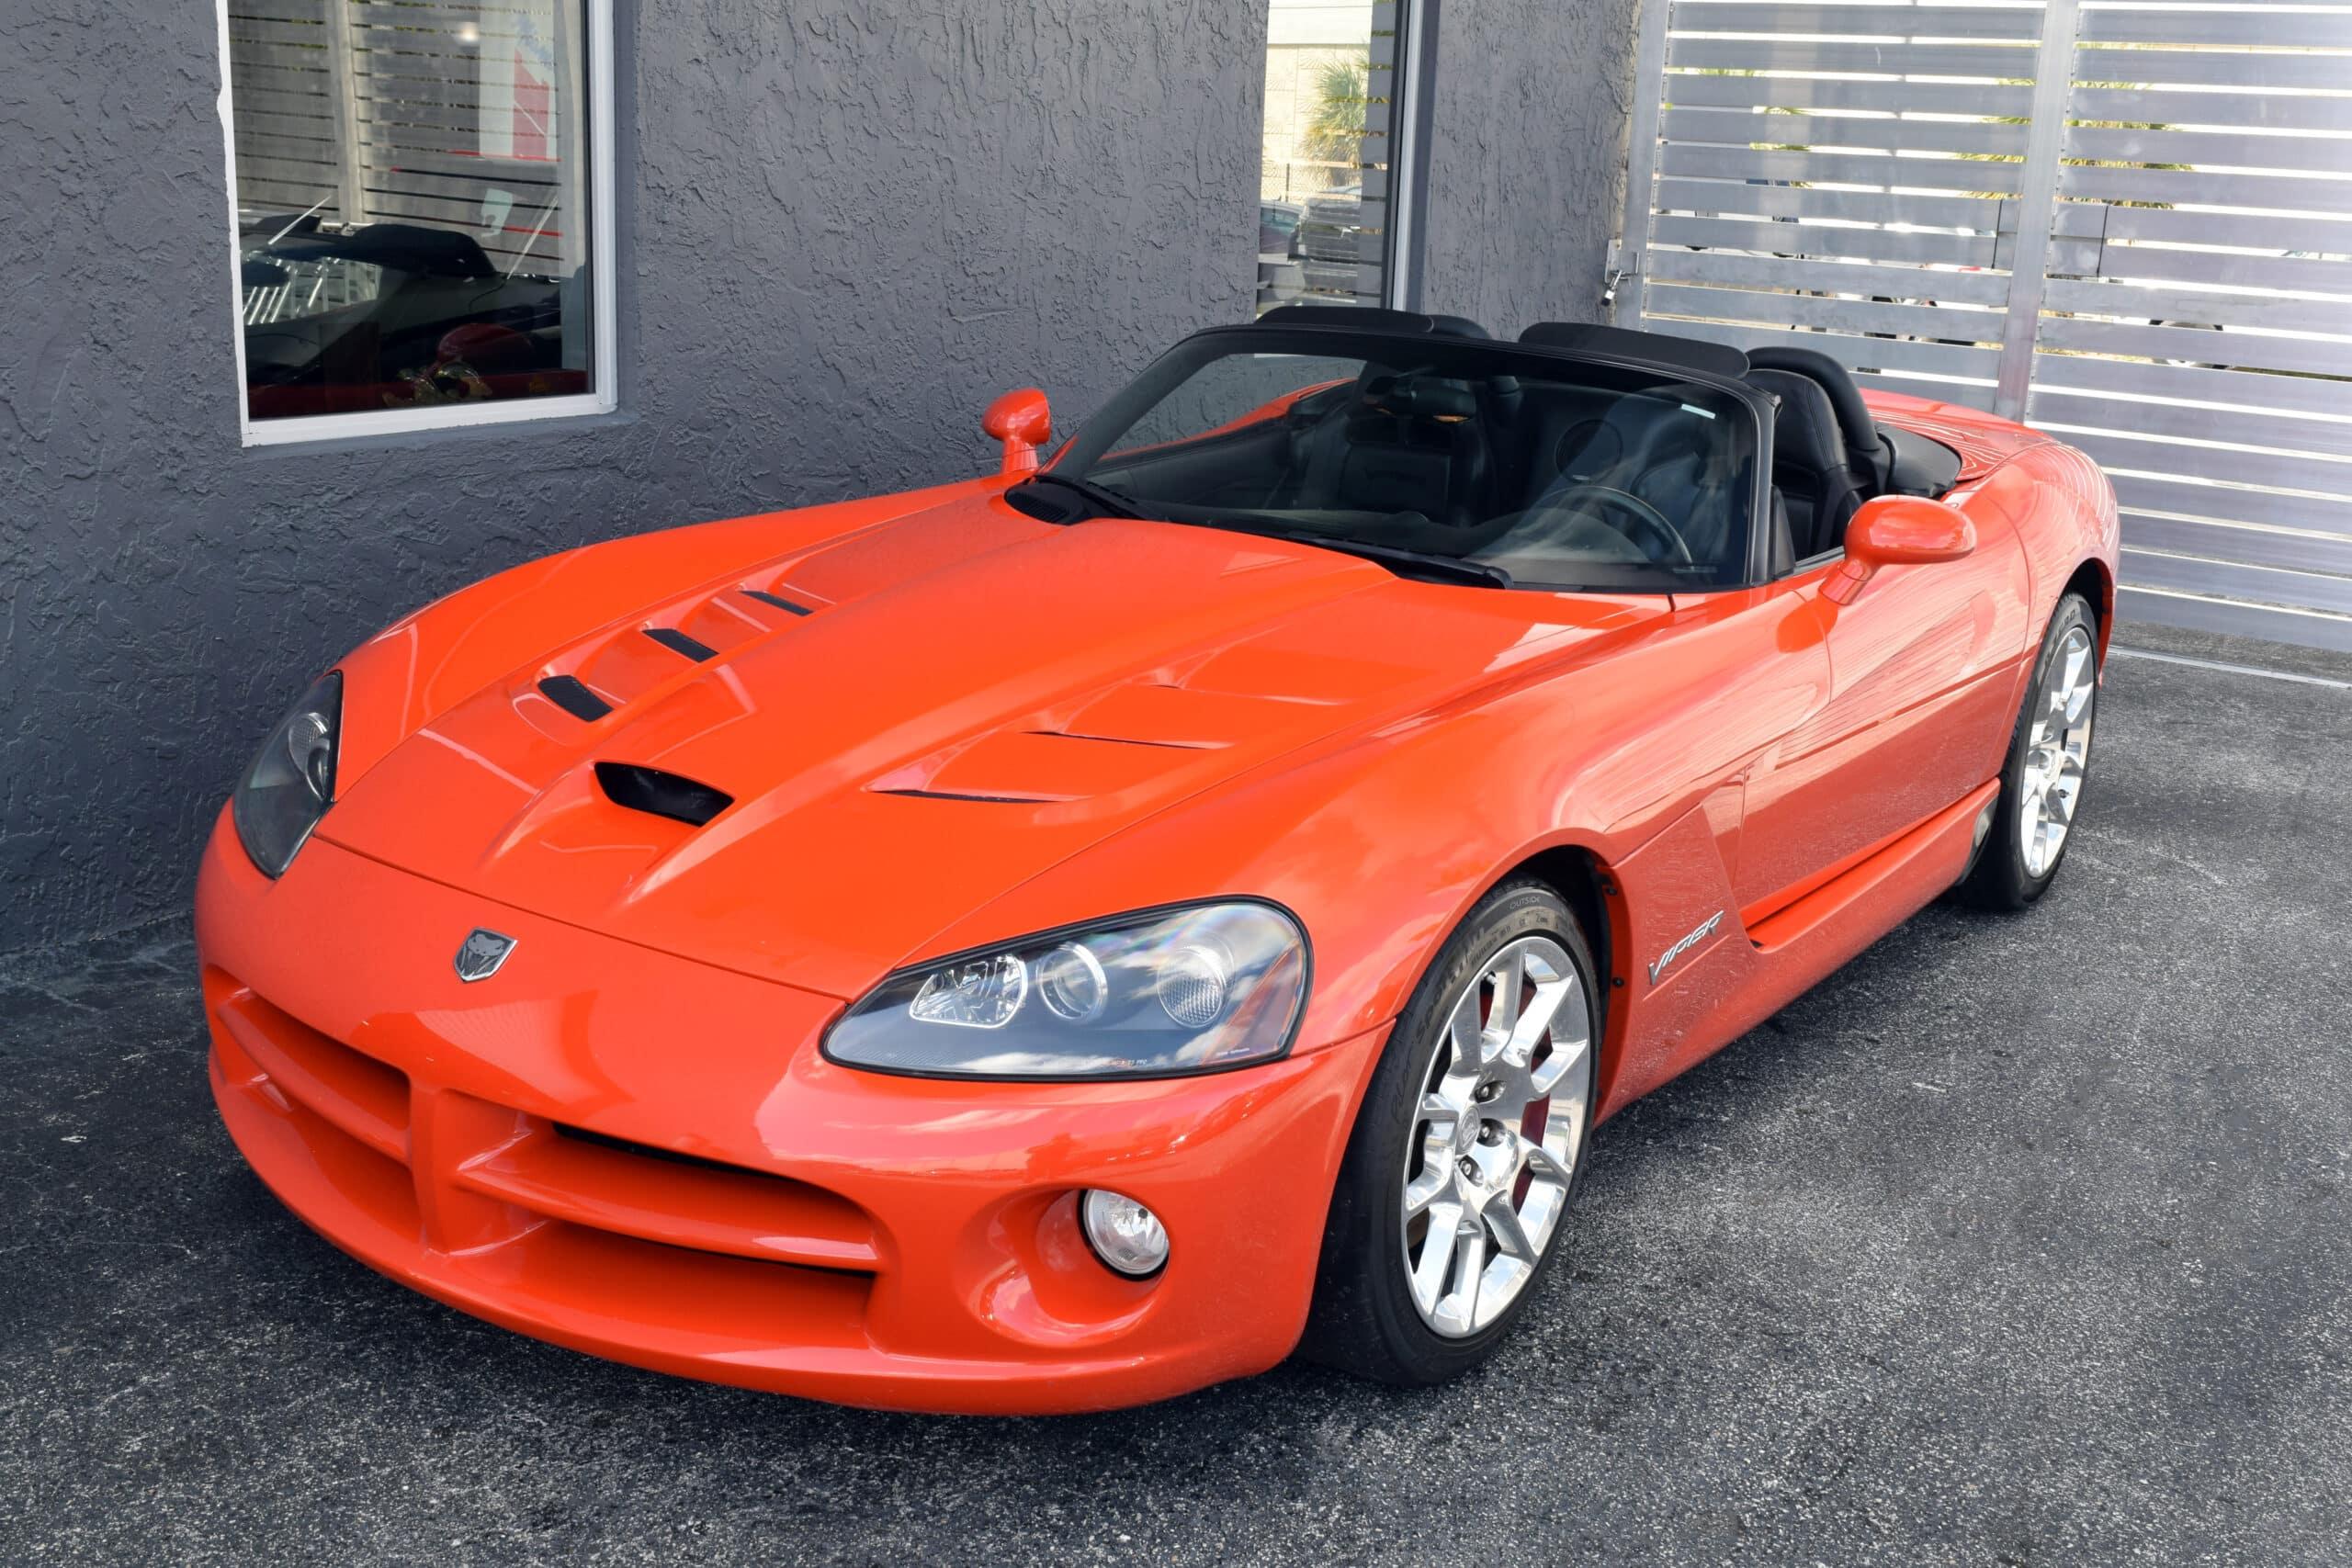 2008 Viper SRT10 Roadster, rare Viper Very Orange Pearl, only 29K miles, amazing original condition.